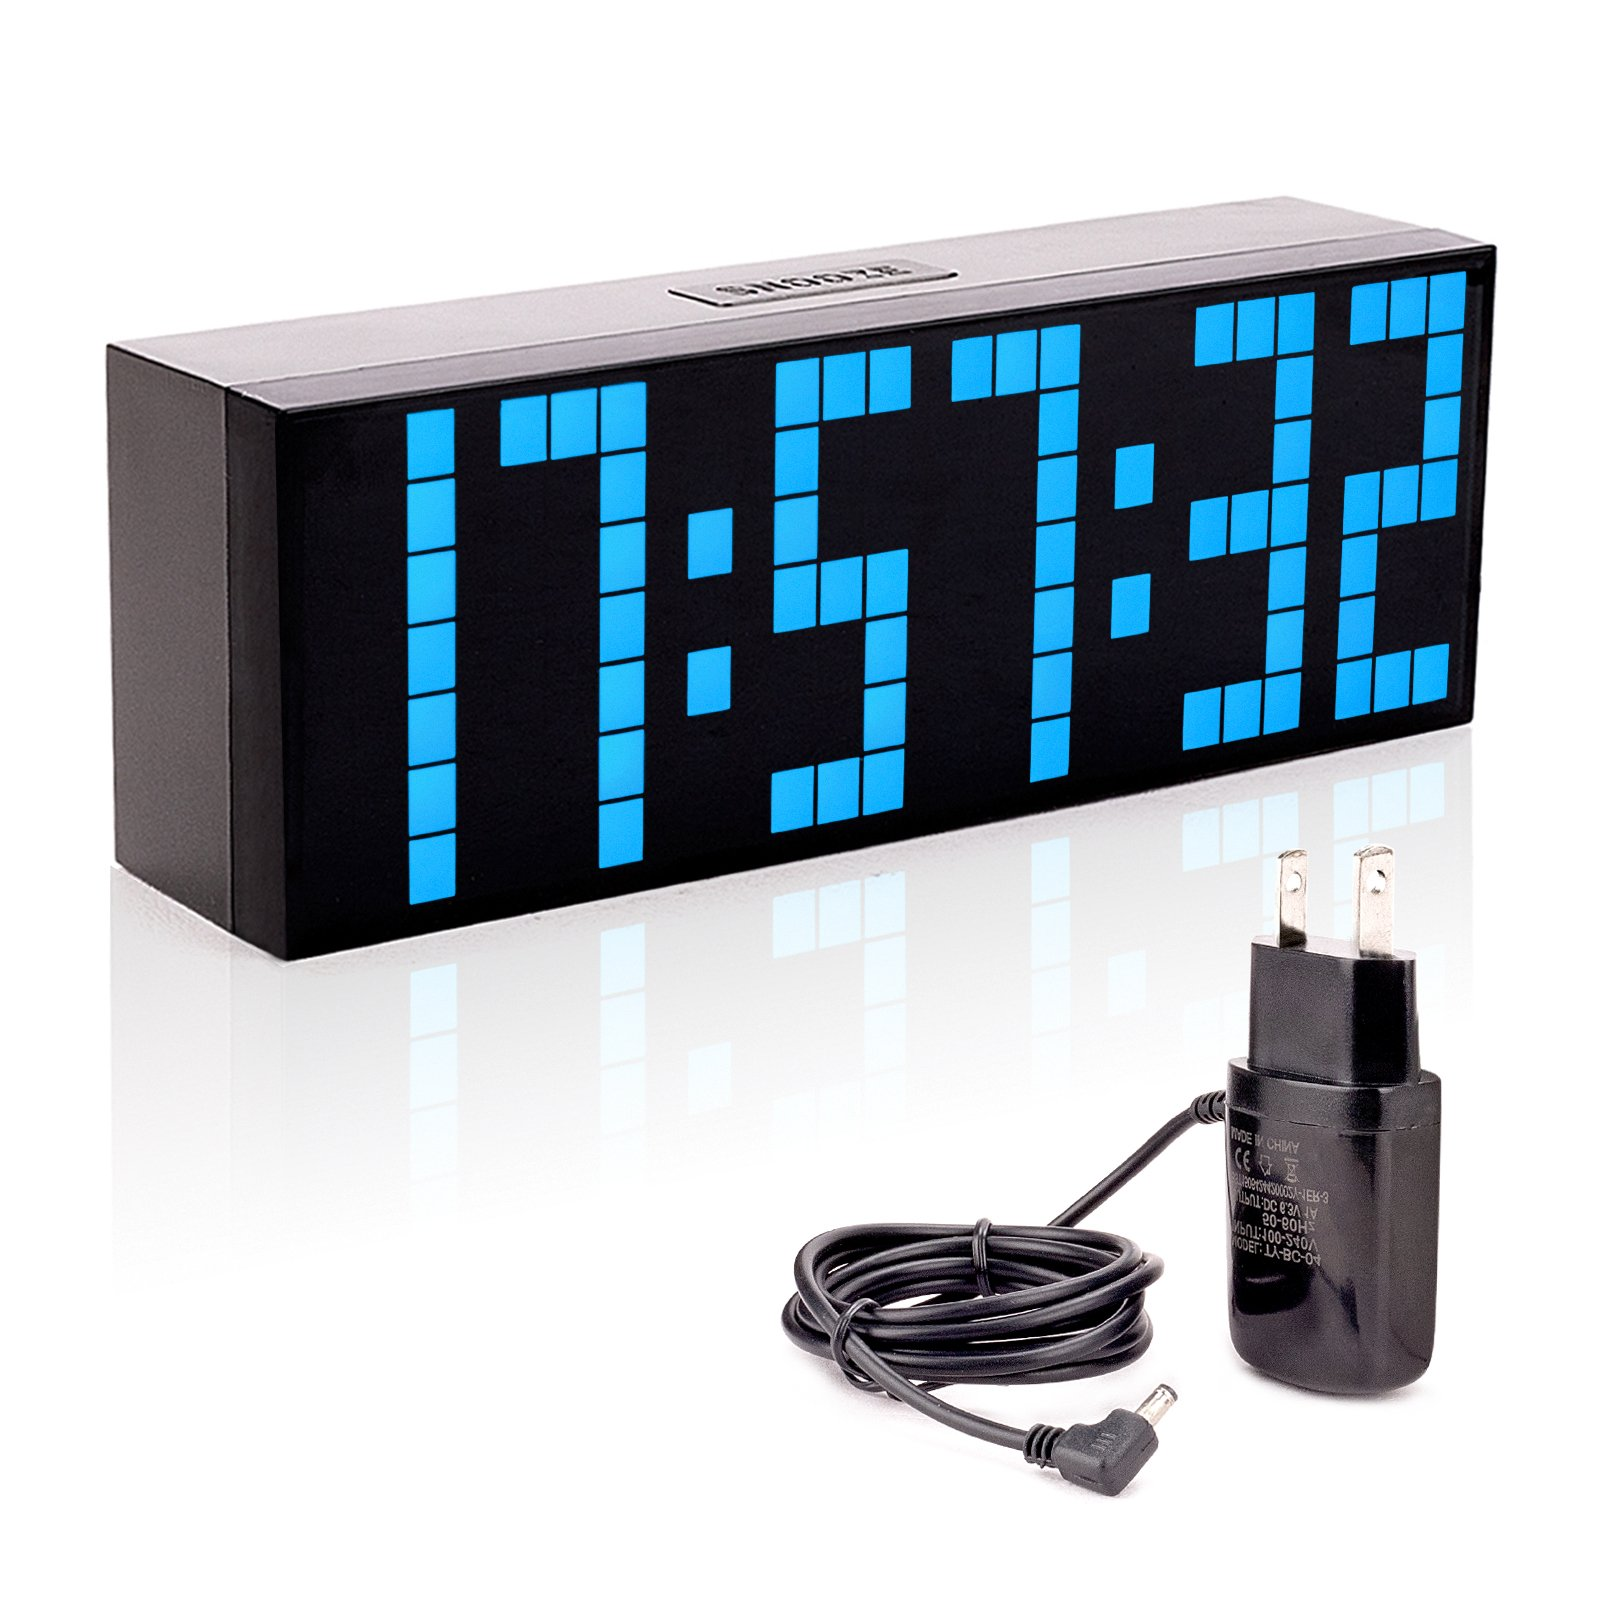 Leadleds LED Digital Alarm Clock, Large Big Number LED Snooze Wall Desk Clock with Countdown Timer Calendar Temperature